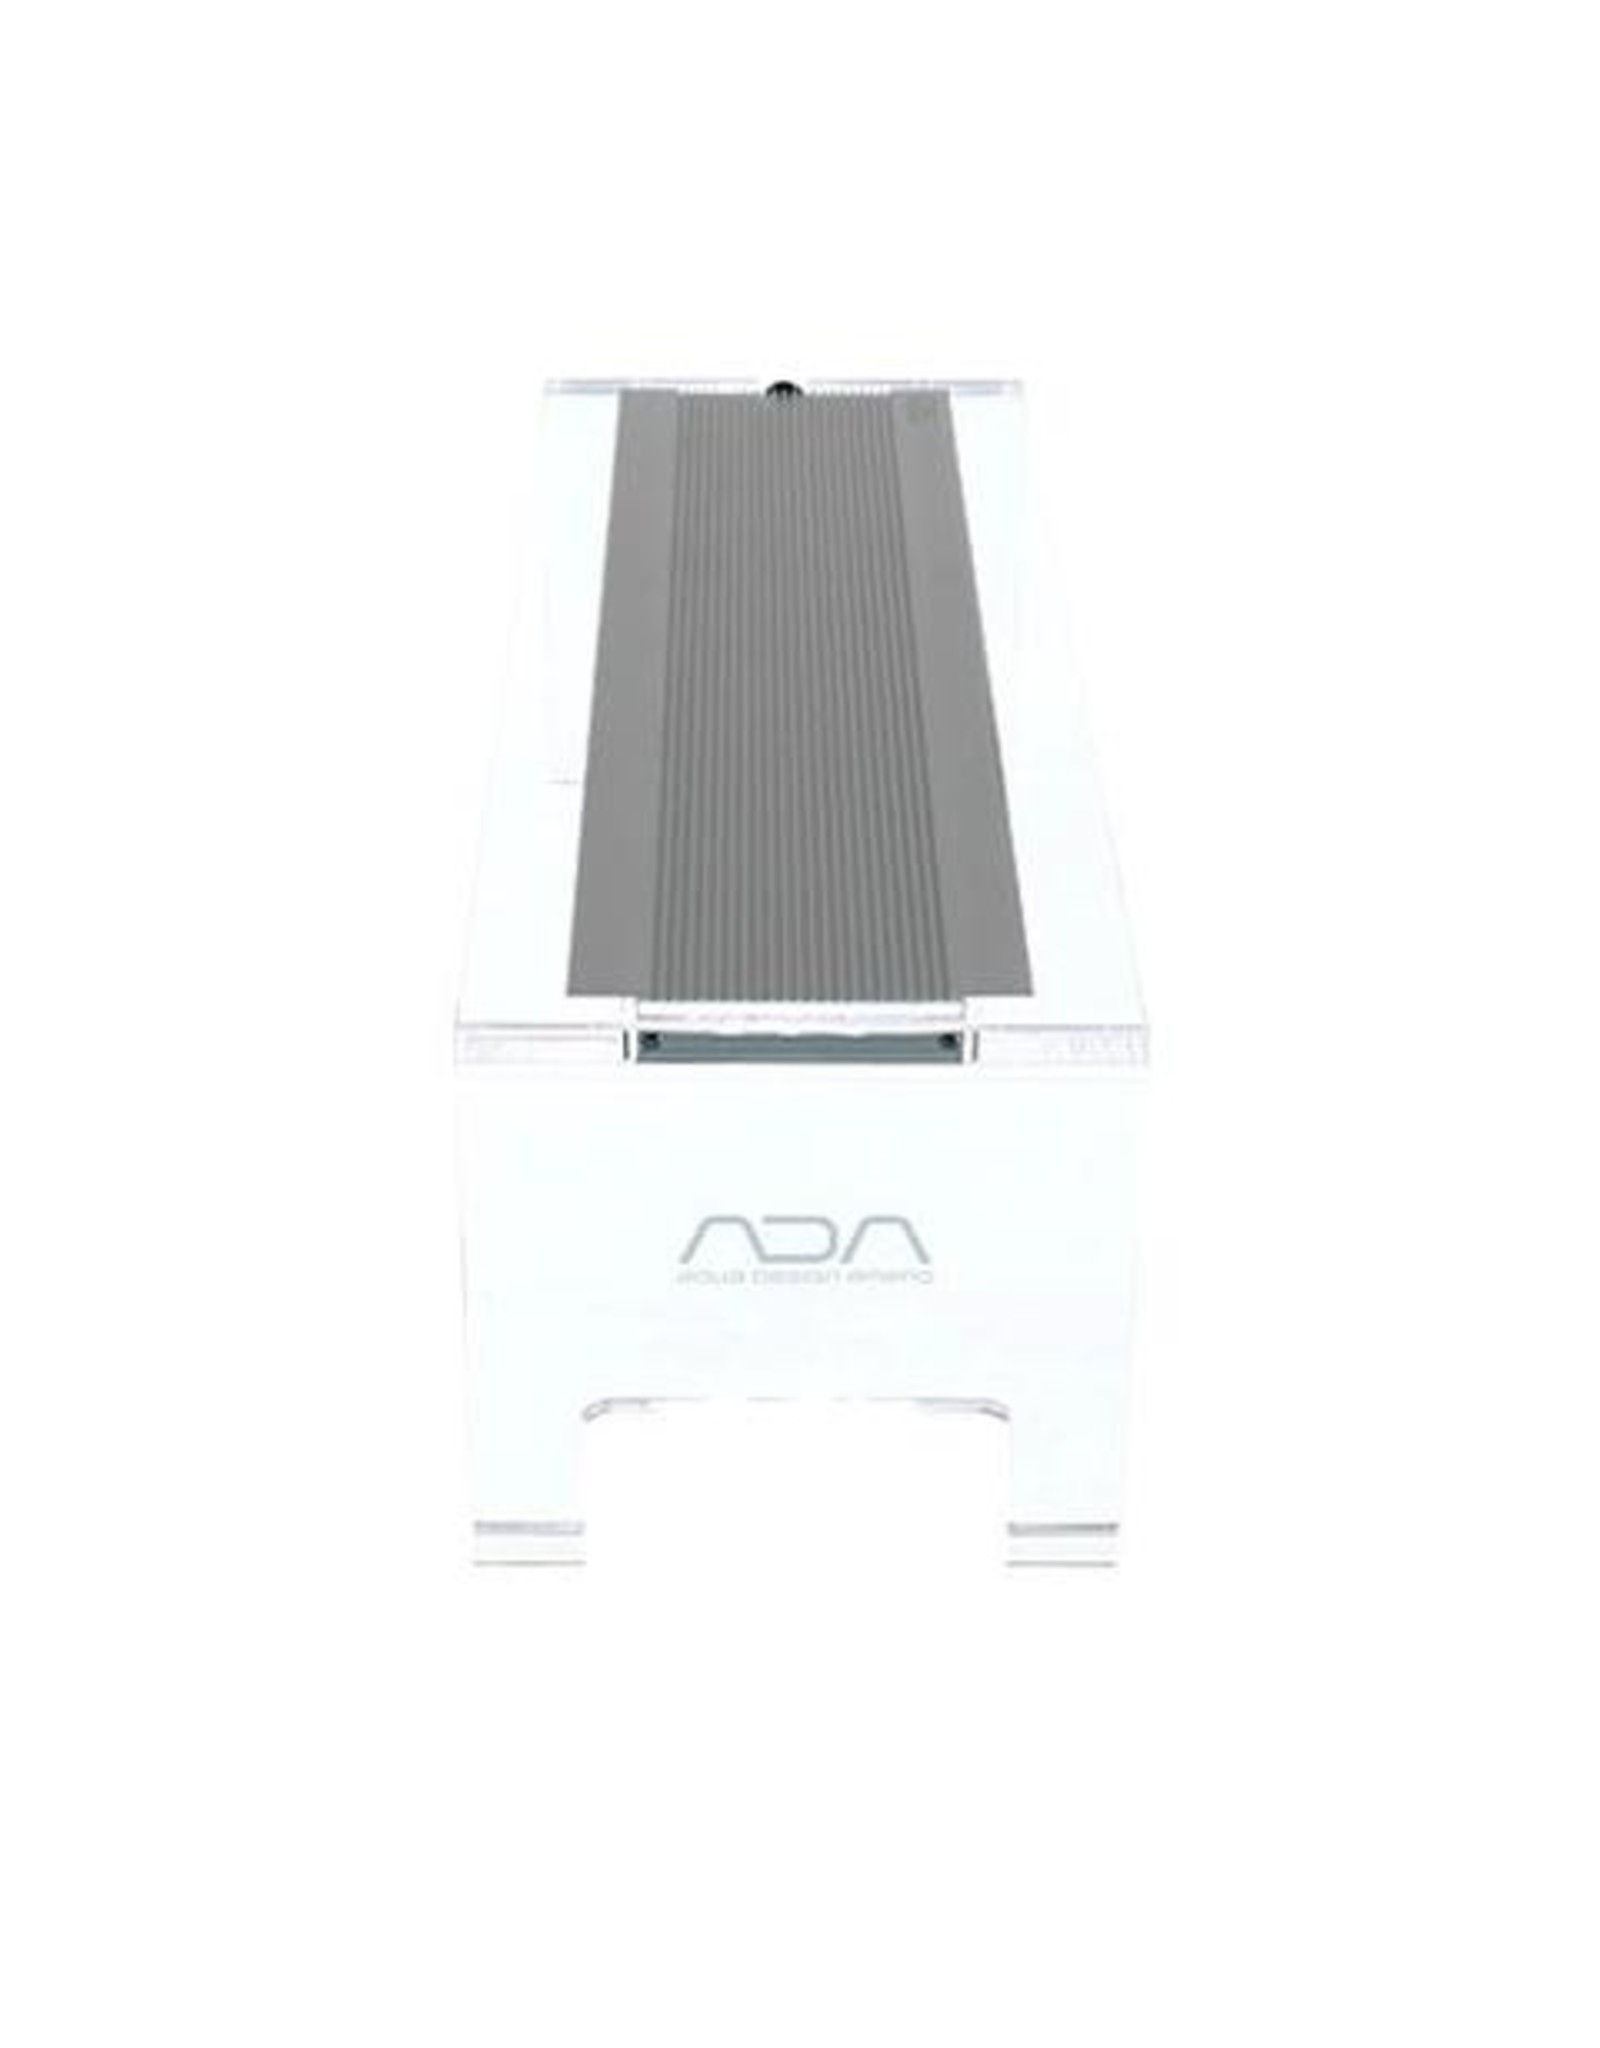 ADA ADA Aquasky G301